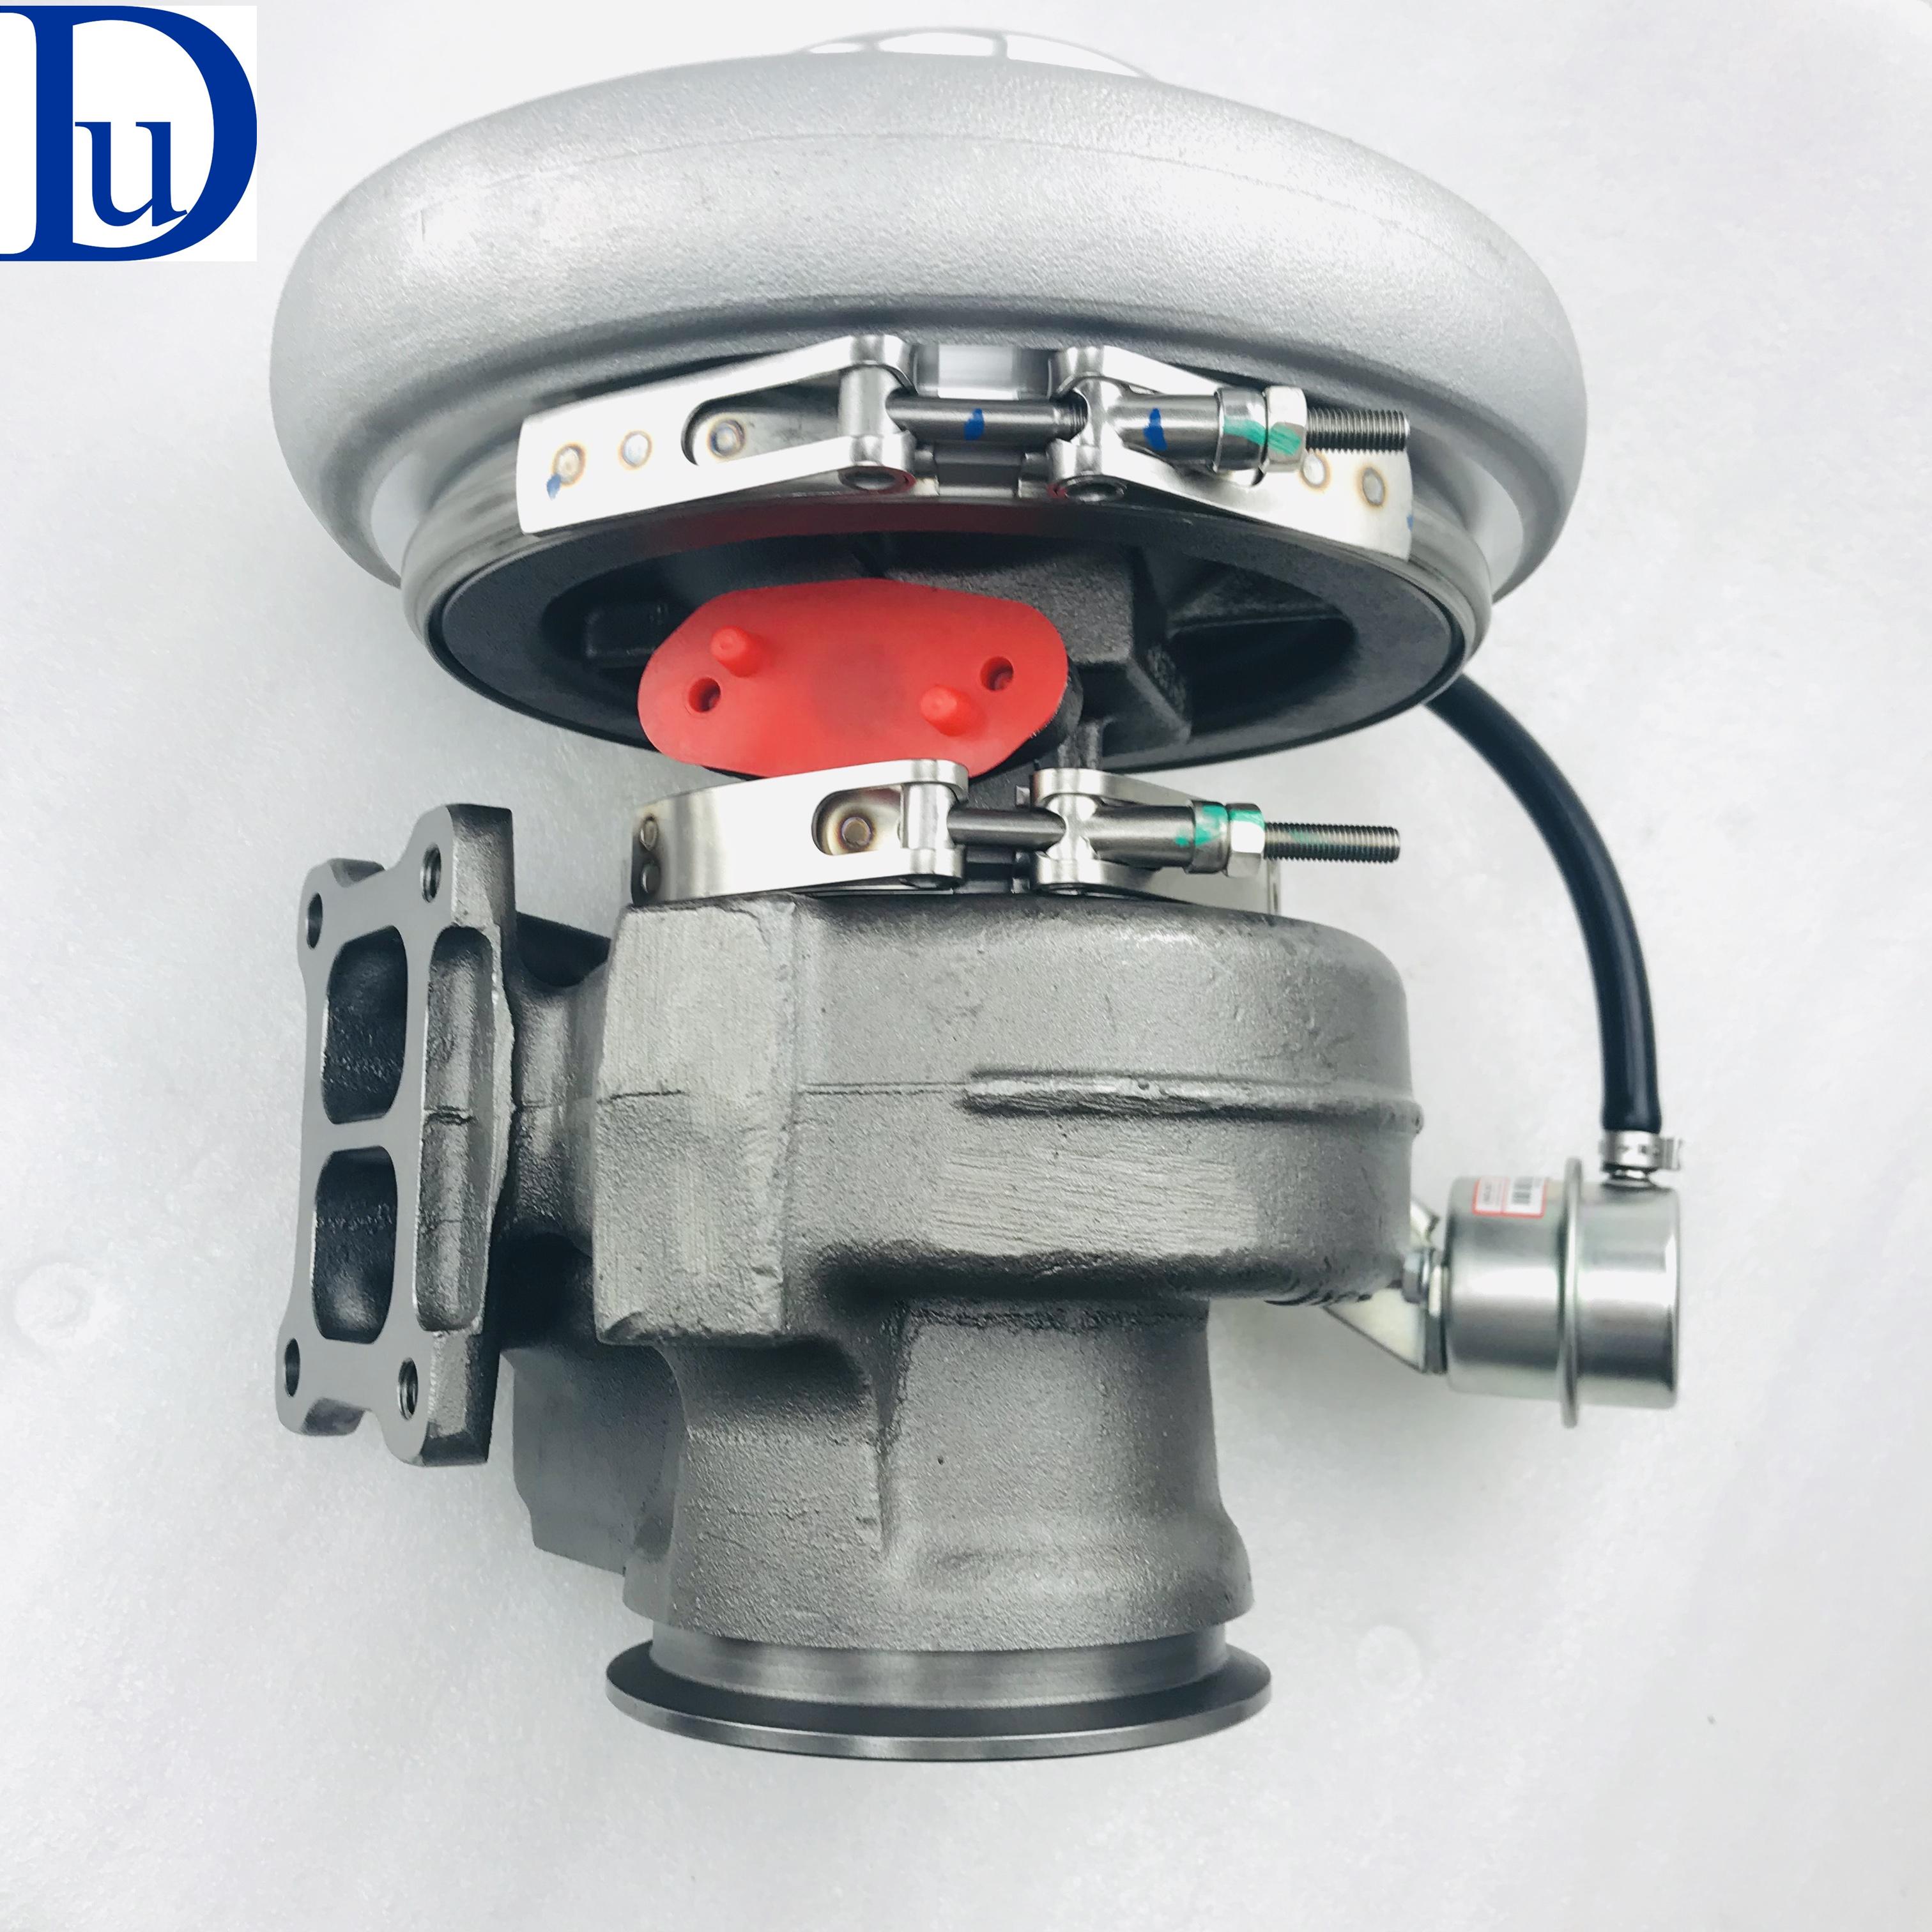 Hx52w Holset Turbo 5043474400 2835833 2841403 2841397 2843755 Turbocharger  For Iveco Cursor 9 Engine - Buy Hx52w,5043474400,2843755 Product on